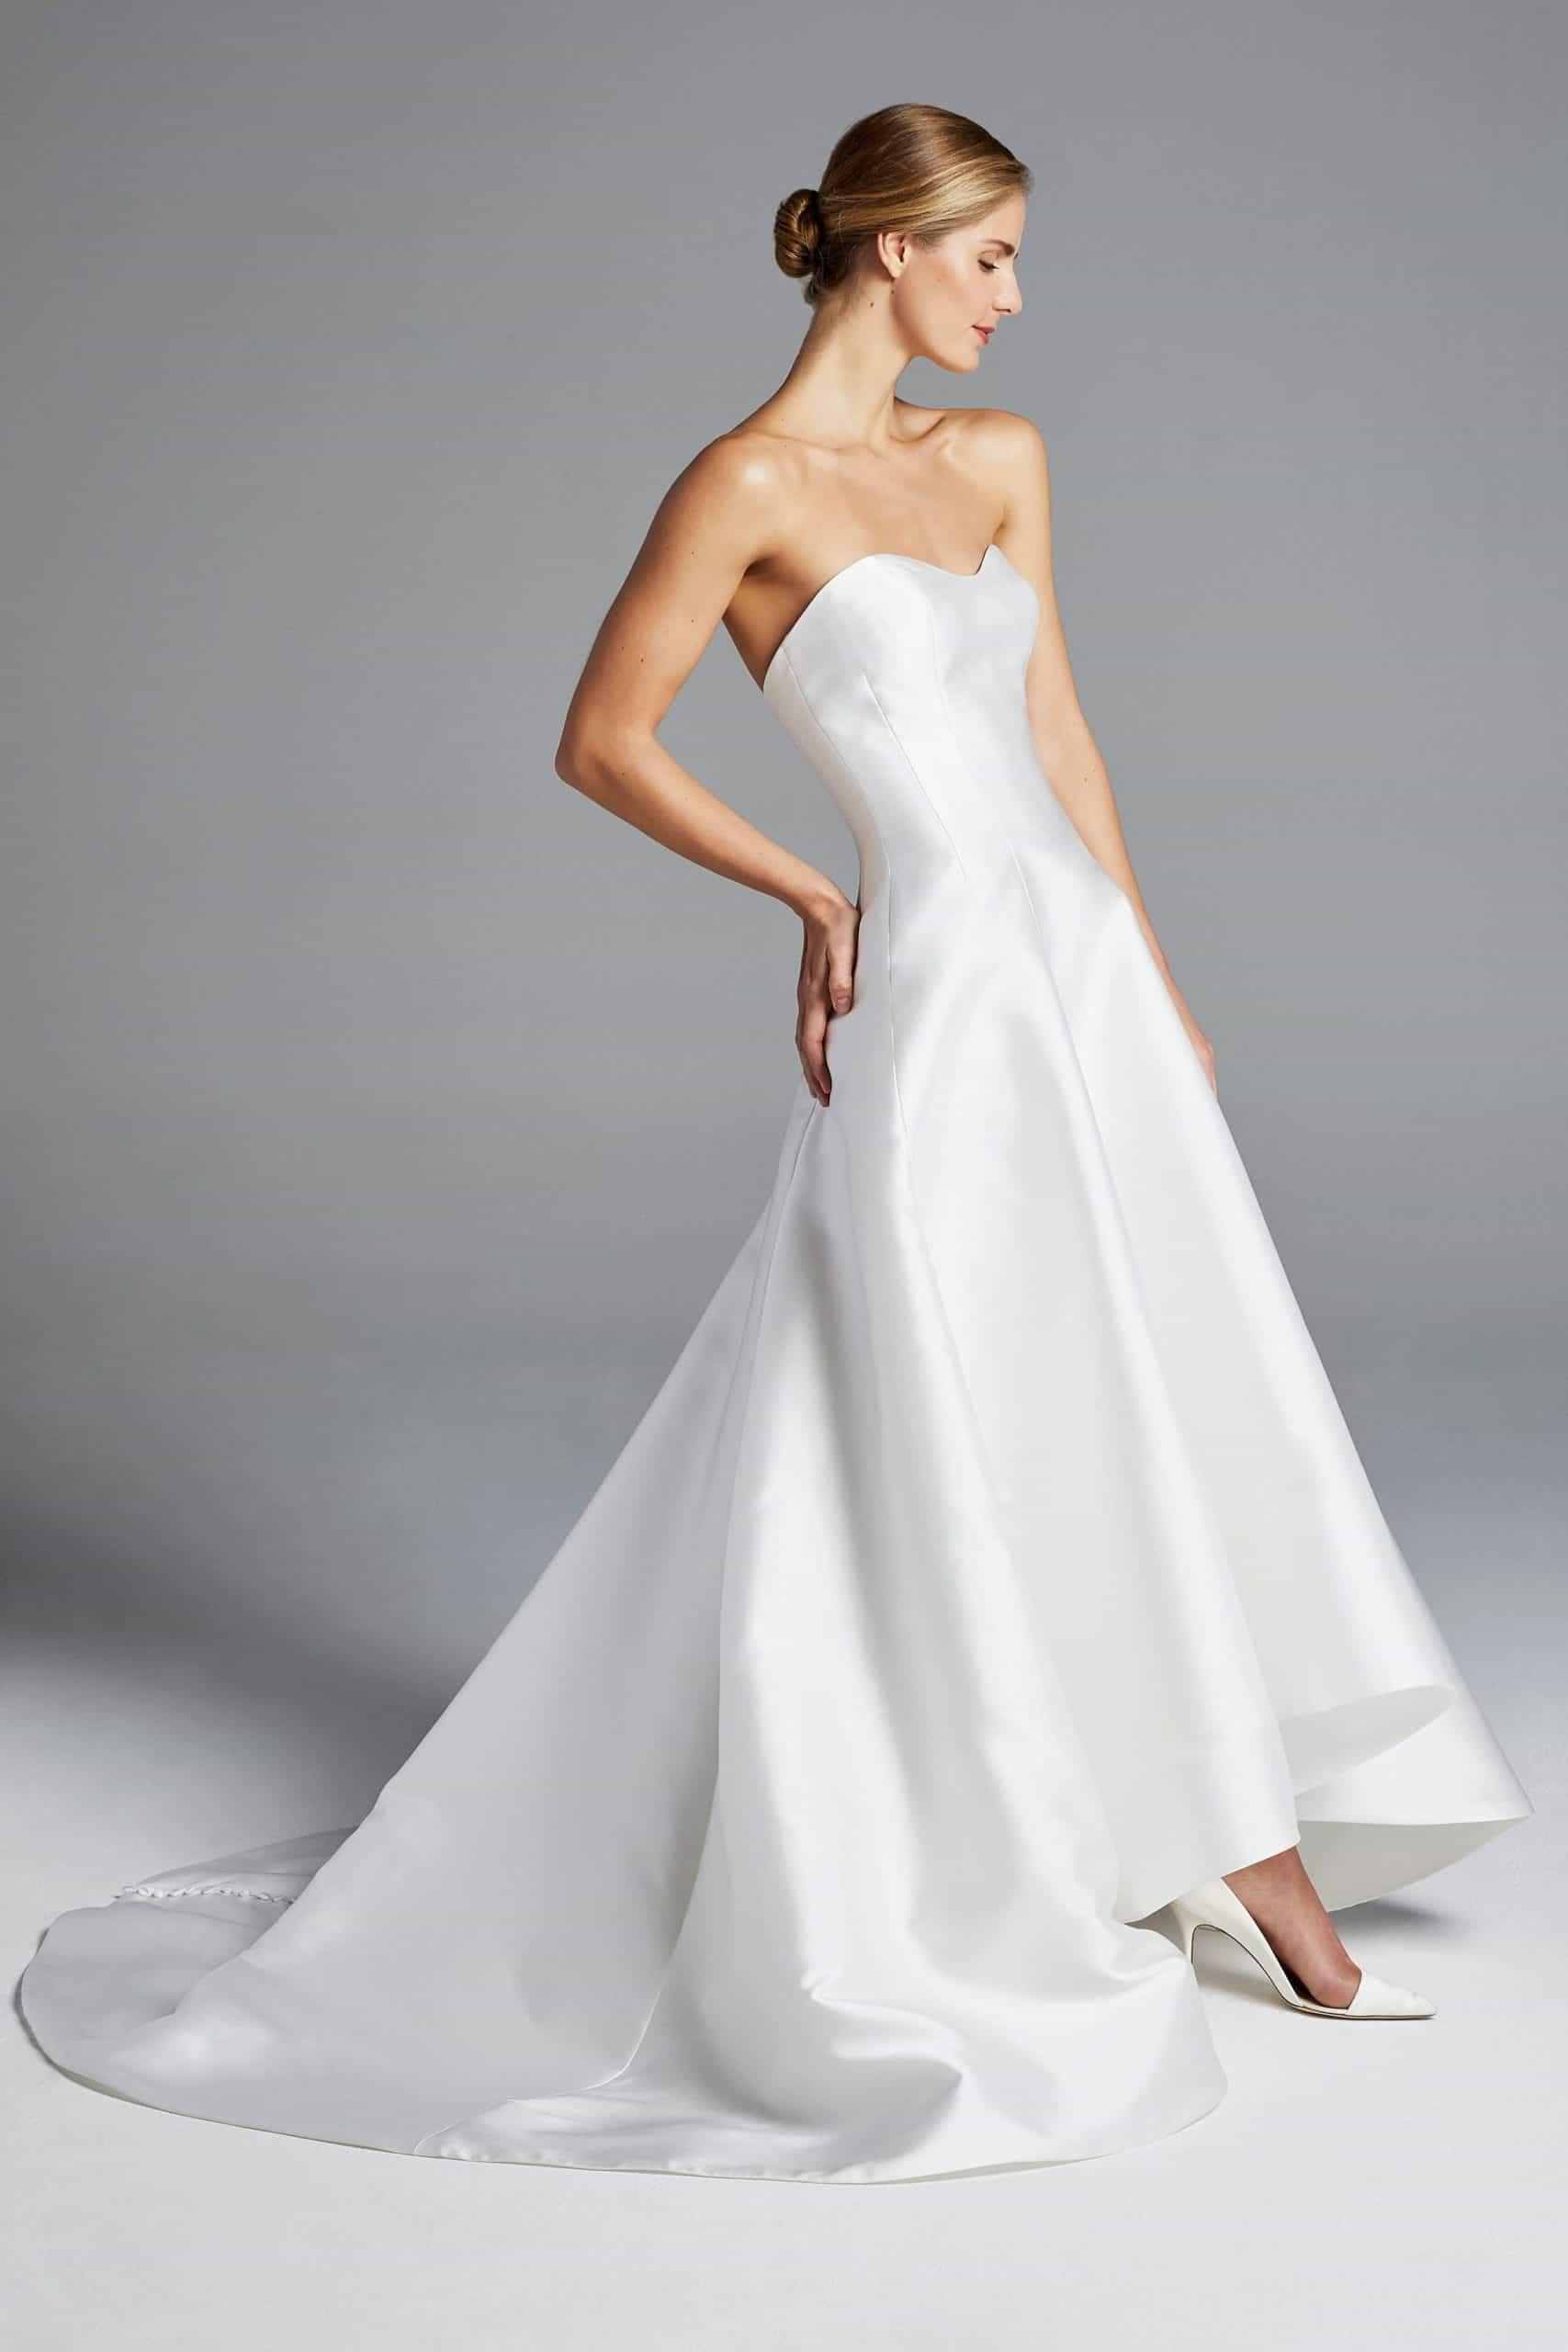 strapless silk wedding dress by Anne Barge